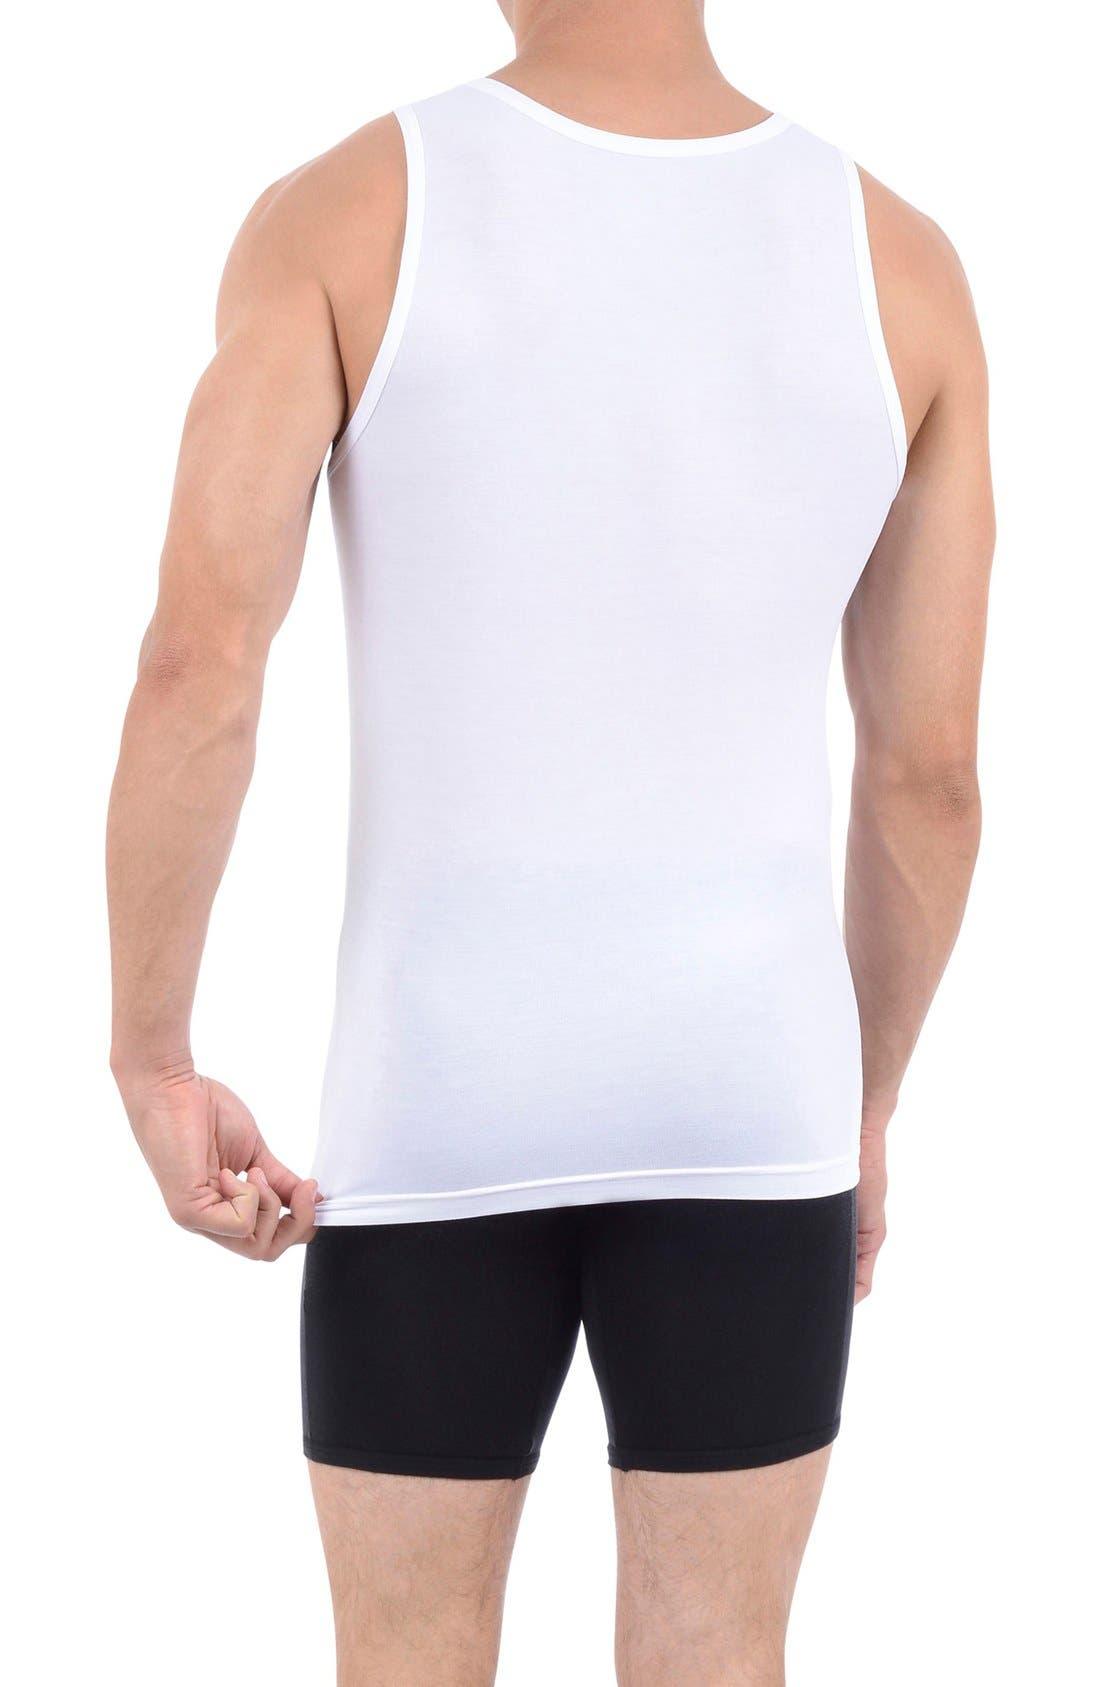 TOMMY JOHN, Second Skin Tank Undershirt, Alternate thumbnail 3, color, WHITE